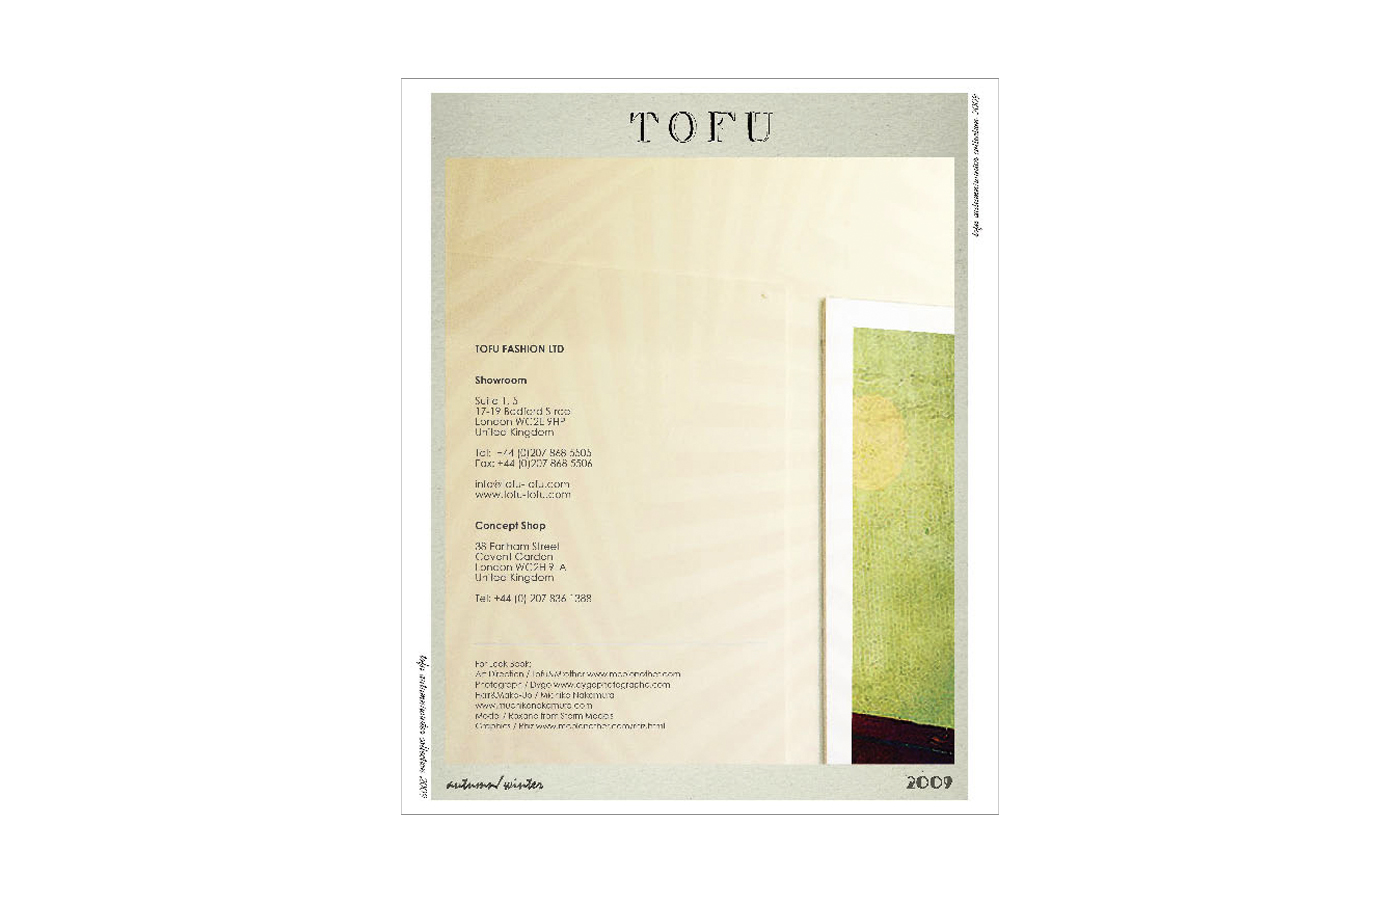 tofuaw2009